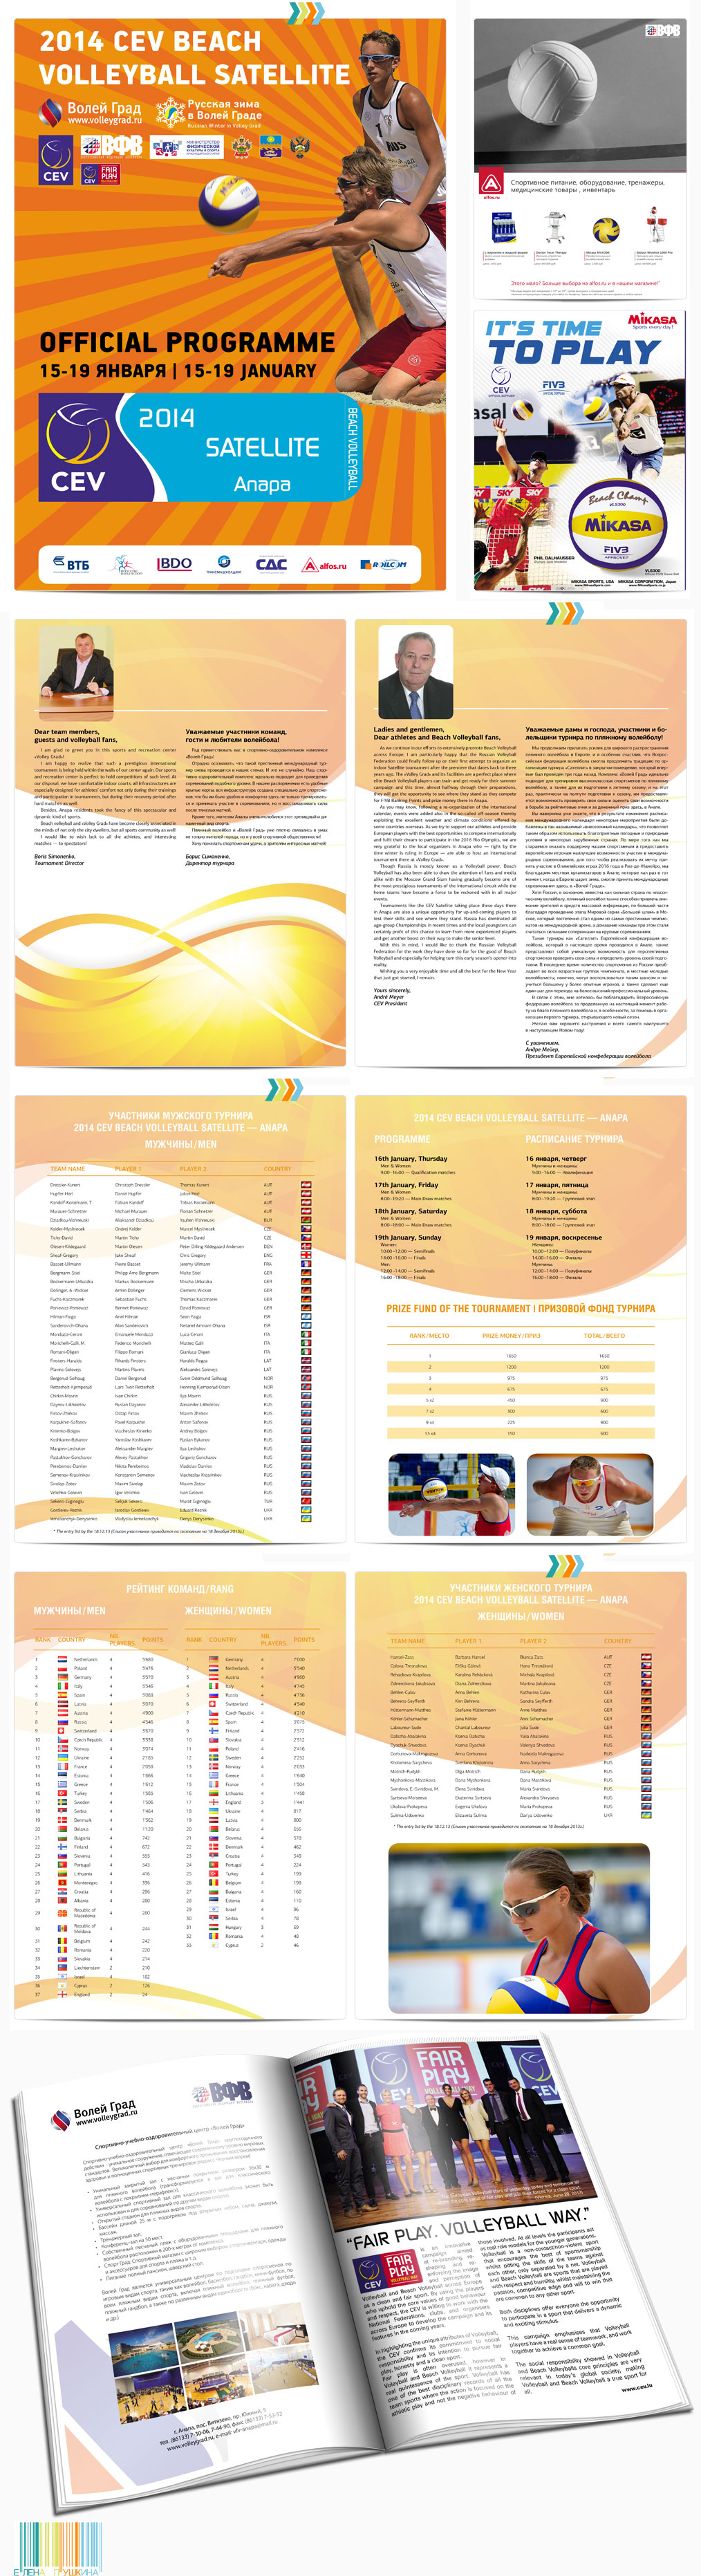 «2014 CEV BEACH VOLLEYBALL SATELLITE»— разработка дизайна с«нуля» ивёрстка брошюры Дизайн брошюр, буклетов Портфолио